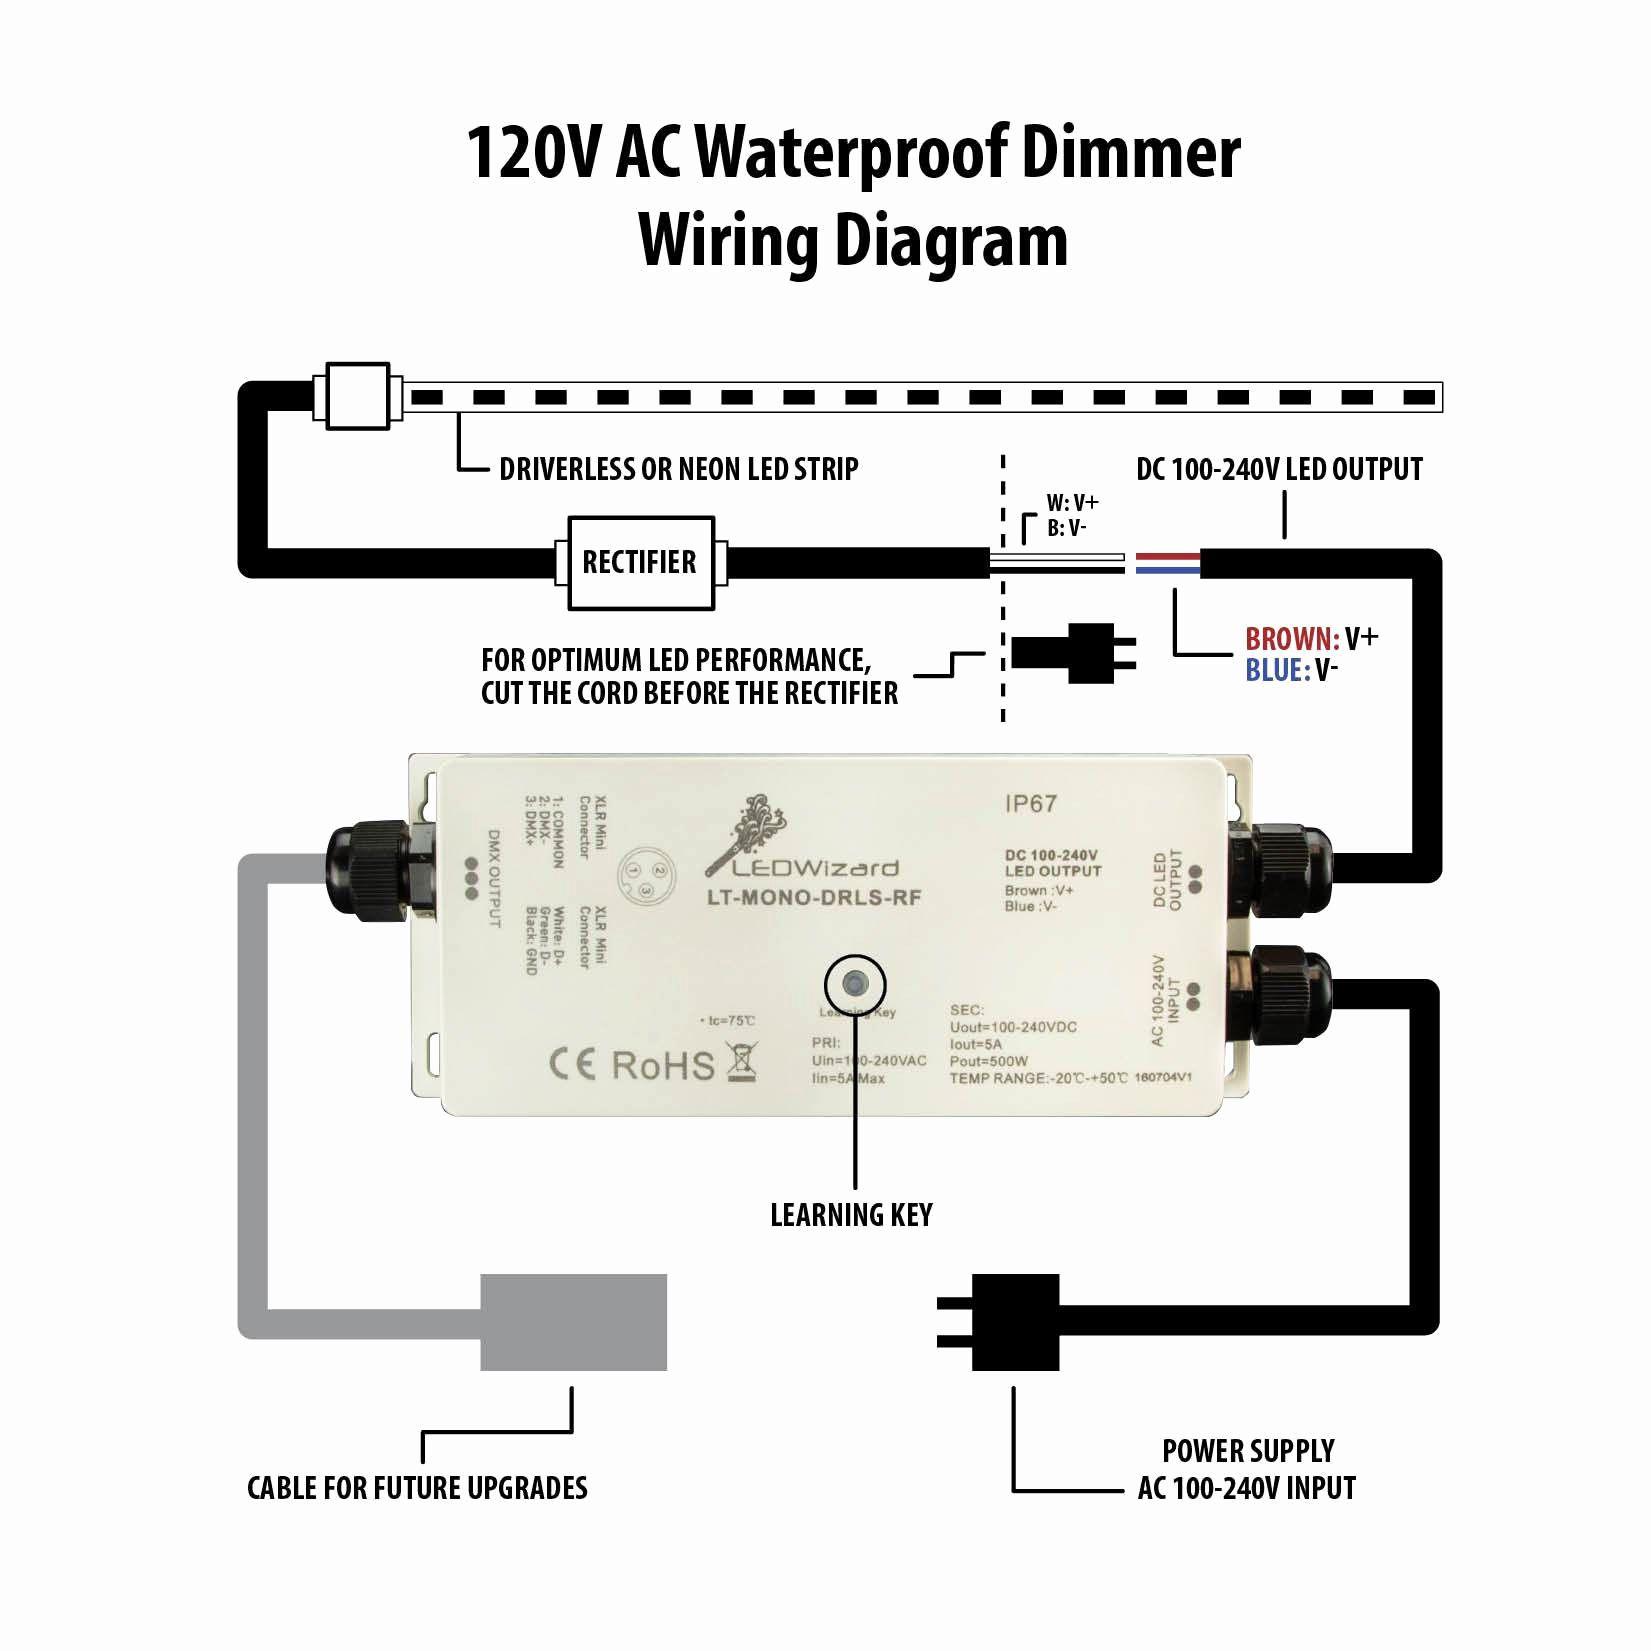 4 Prong Twist Plug Wiring Diagram | Wiring Diagram - 4 Prong Twist Lock Plug Wiring Diagram